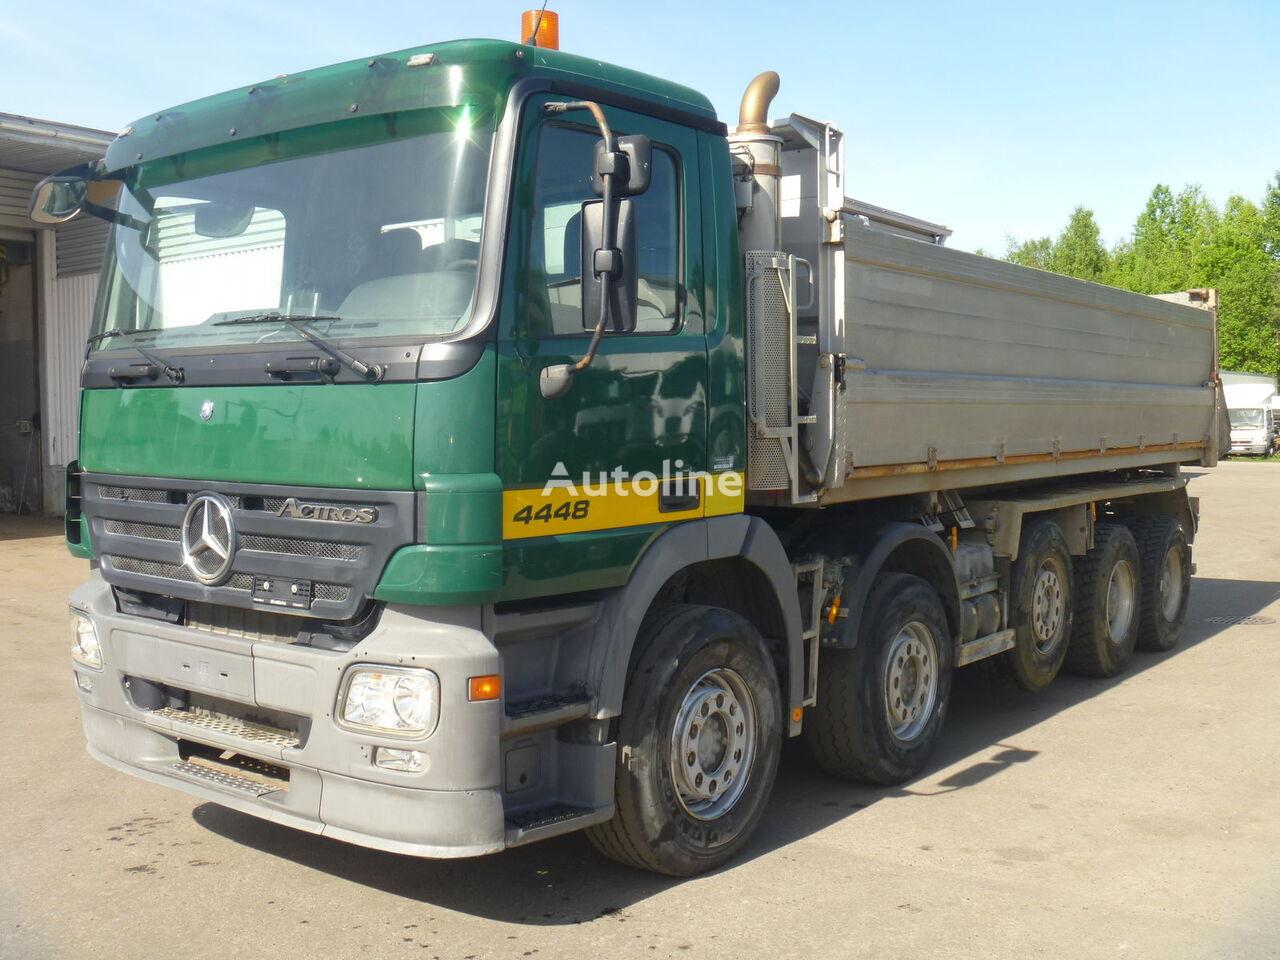 kallur veoauto MERCEDES-BENZ Actros 4448